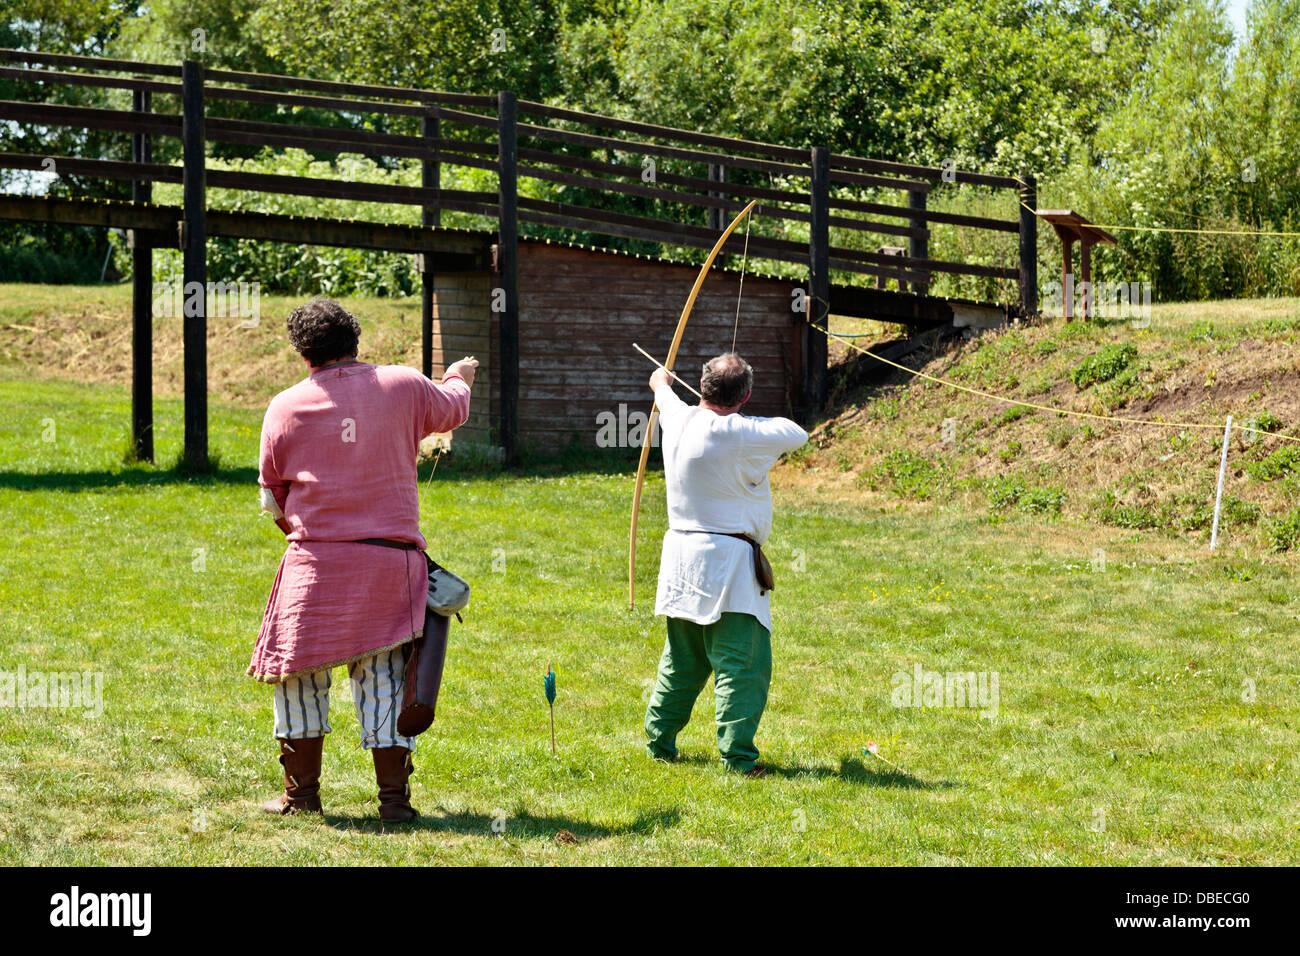 Viking archers at Flag Fen Archaeological Park, Peterborough, England - Stock Image